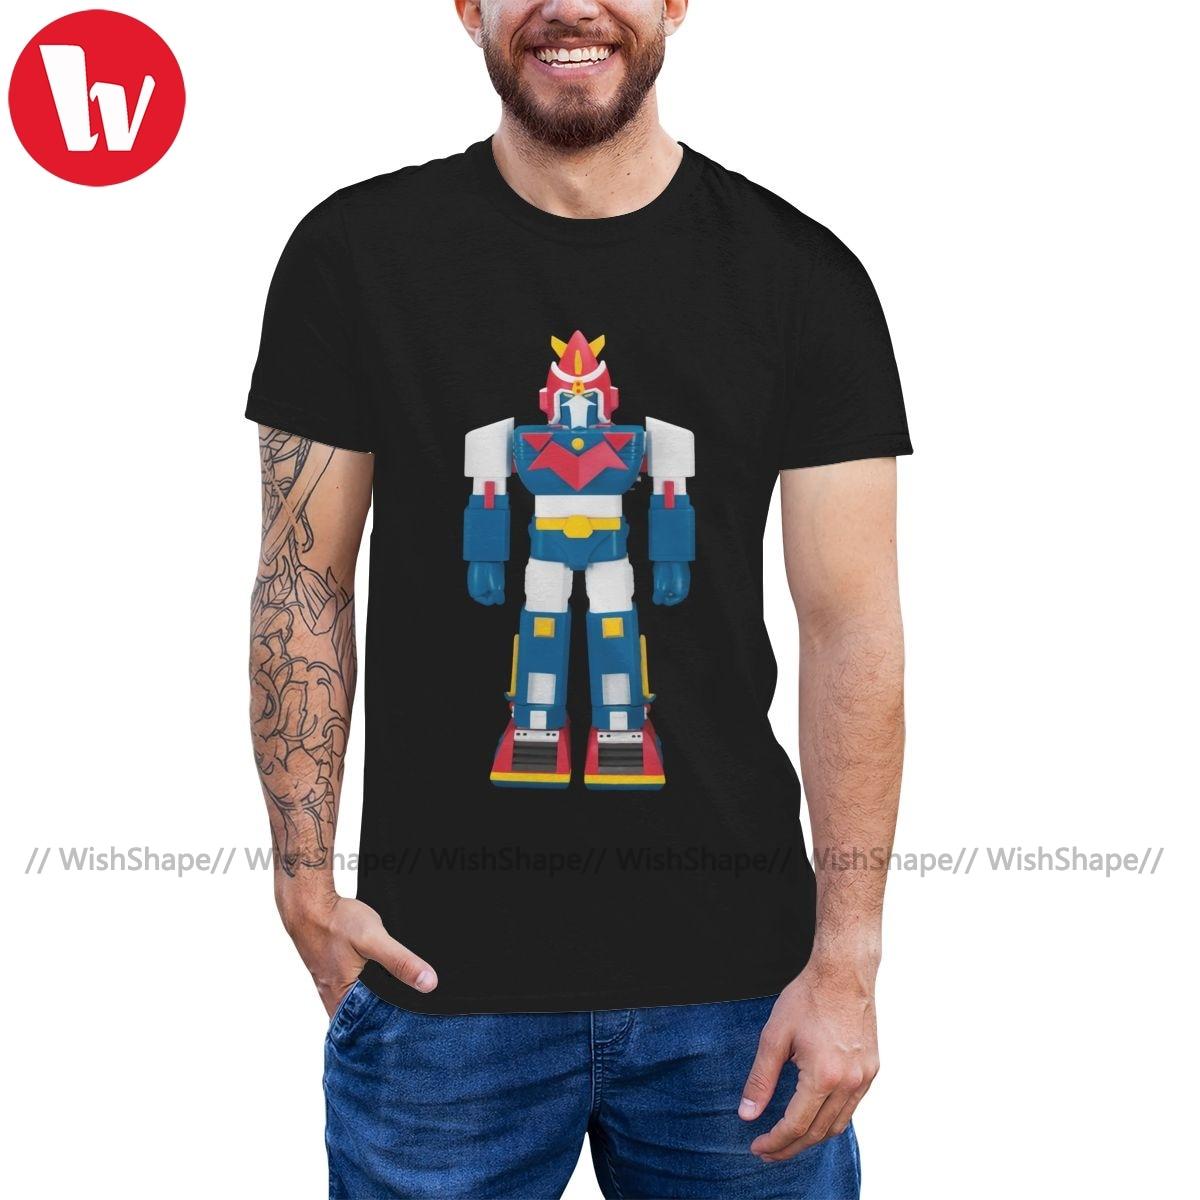 Camiseta Voltron, camiseta gigante Robot, camiseta bonita para hombre, camiseta 100 de algodón con estampado 5x de playa, camiseta de manga corta